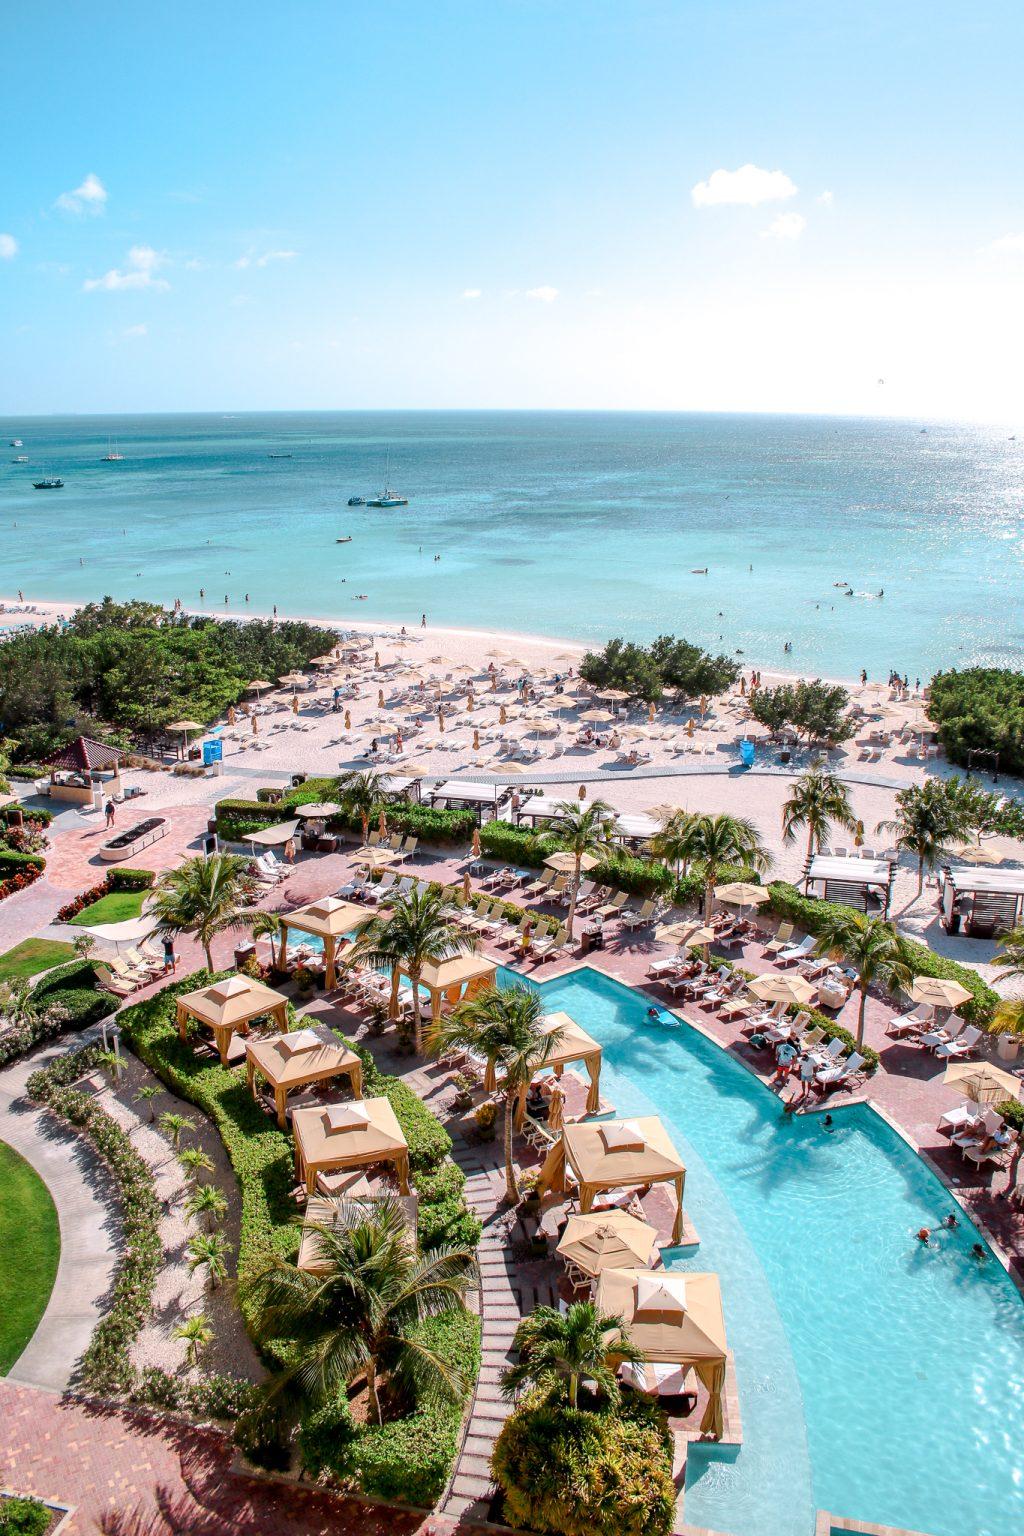 Where To Stay In Aruba: A Luxury Getaway At The Ritz Carlton - balcony views